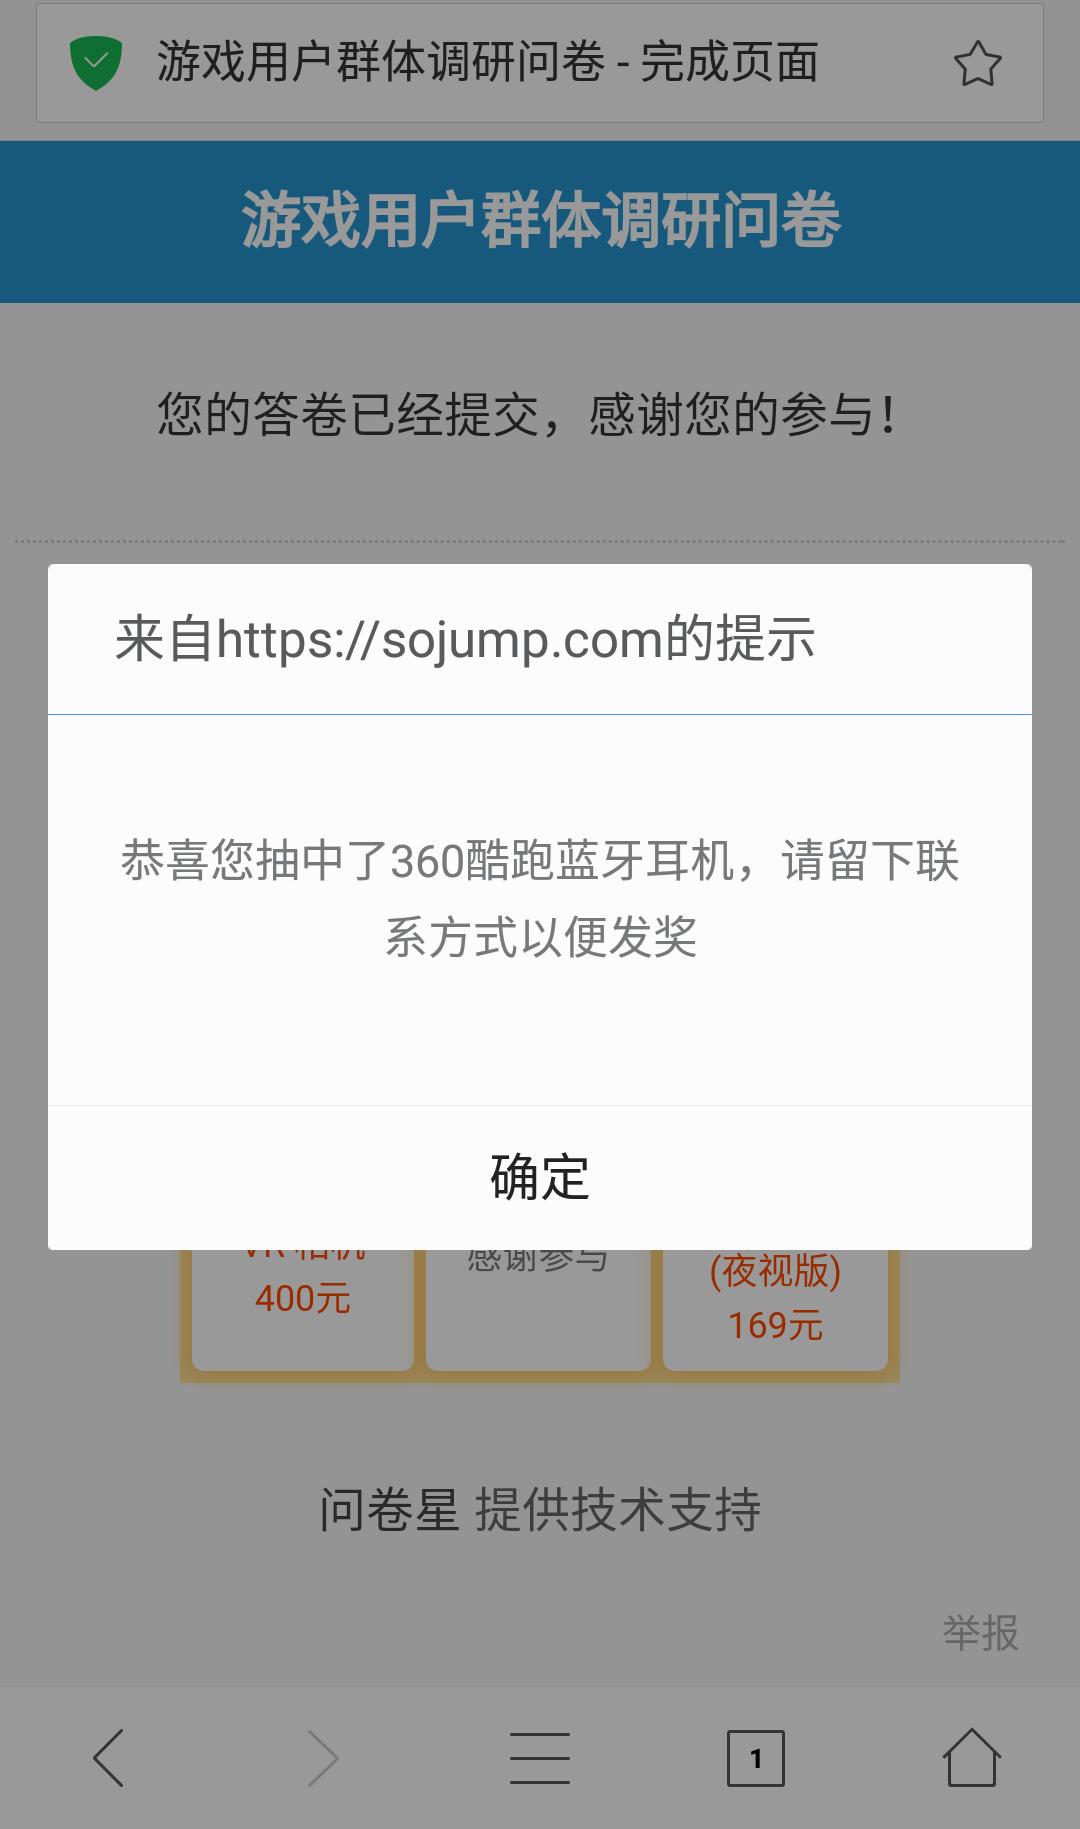 Screenshot_2017-09-14-13-09-06.png